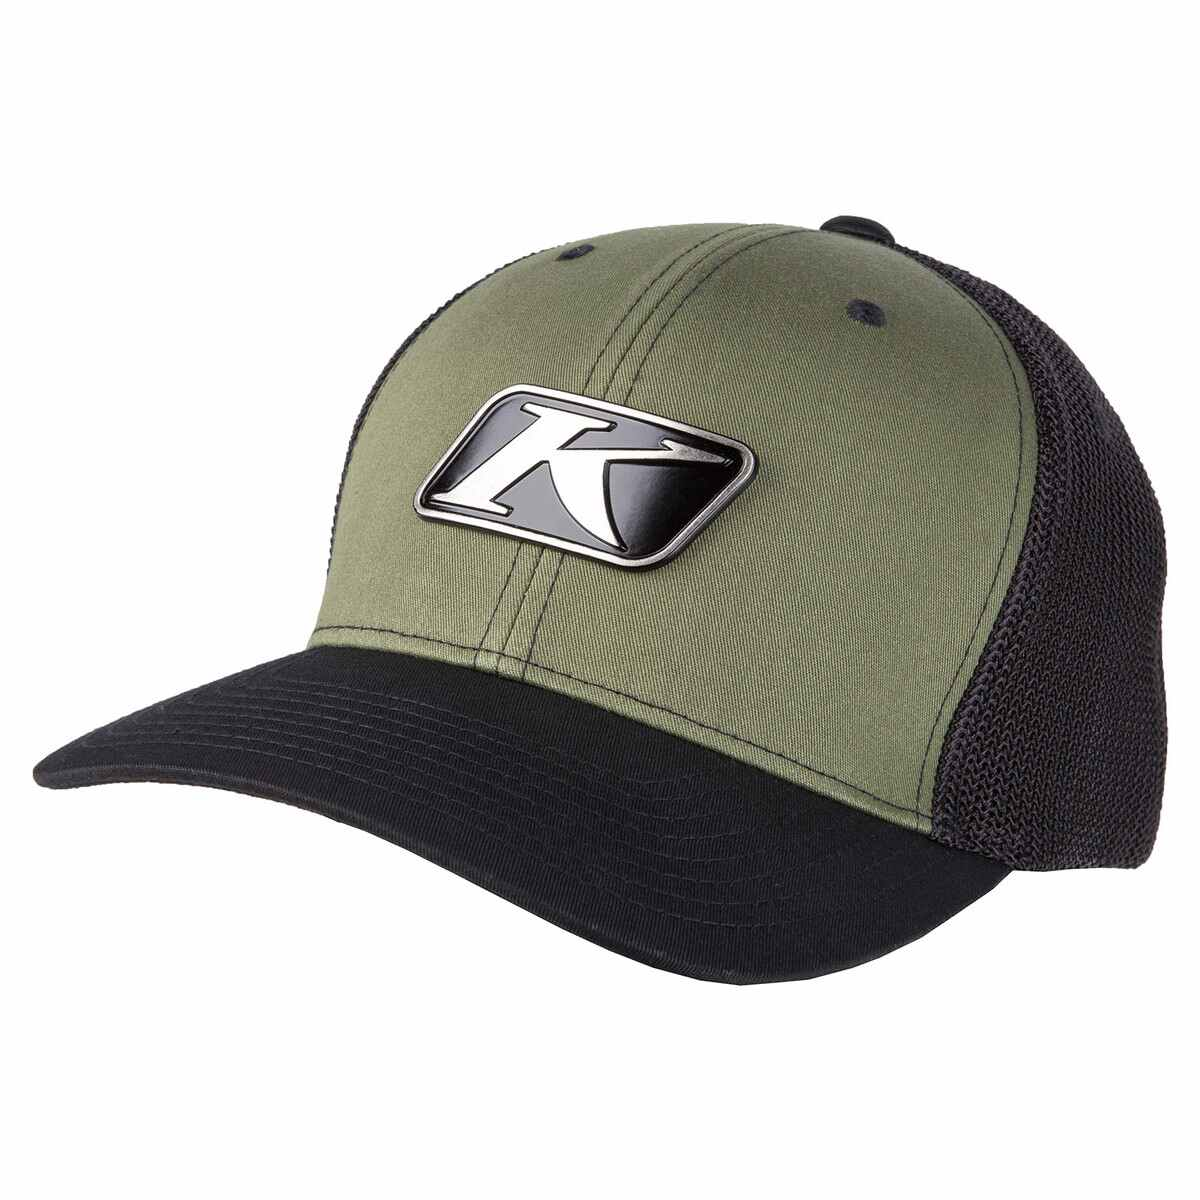 Icon Snap Hat Green & Black